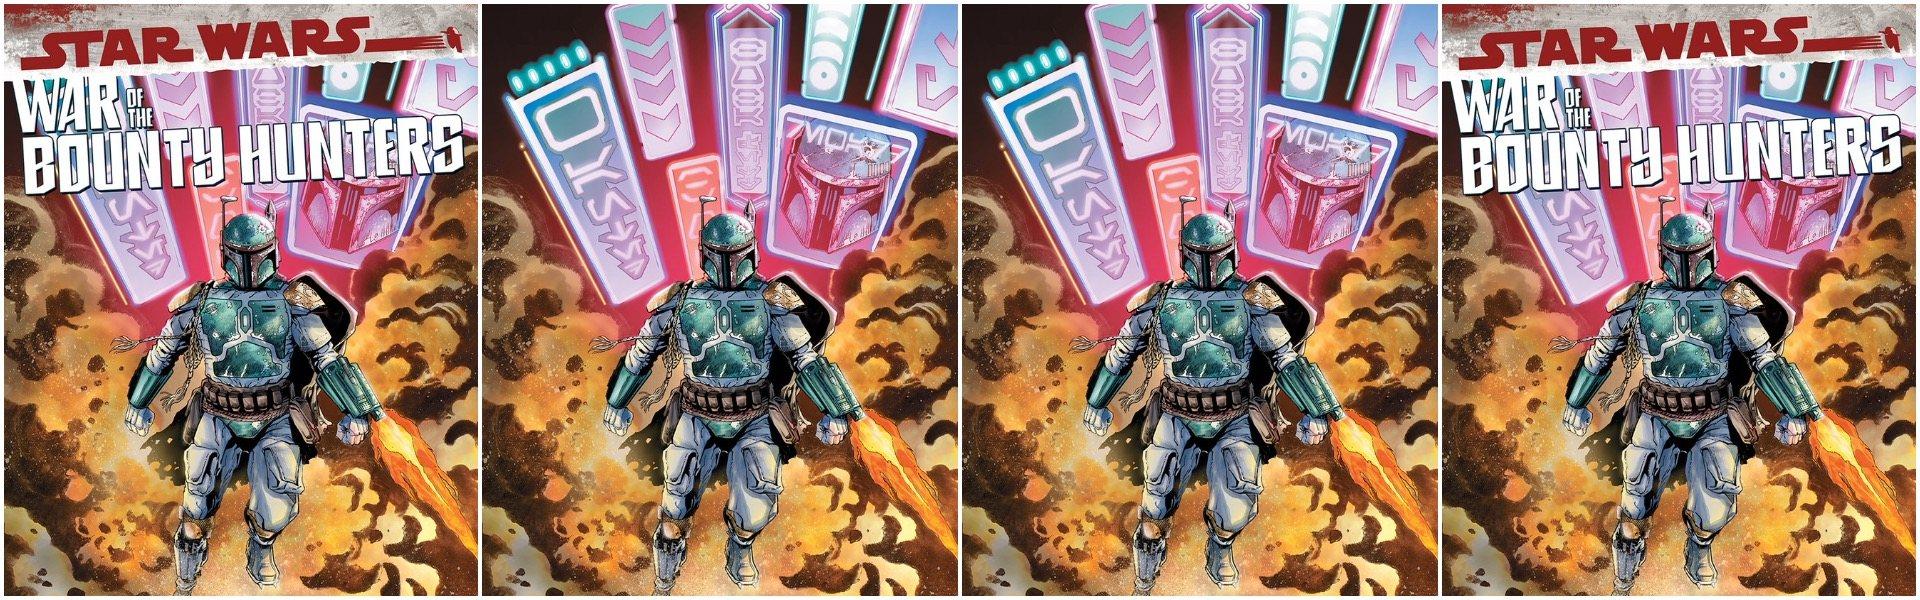 Star Wars War of the Bounty Hunters #1 Jan Duursema Variants